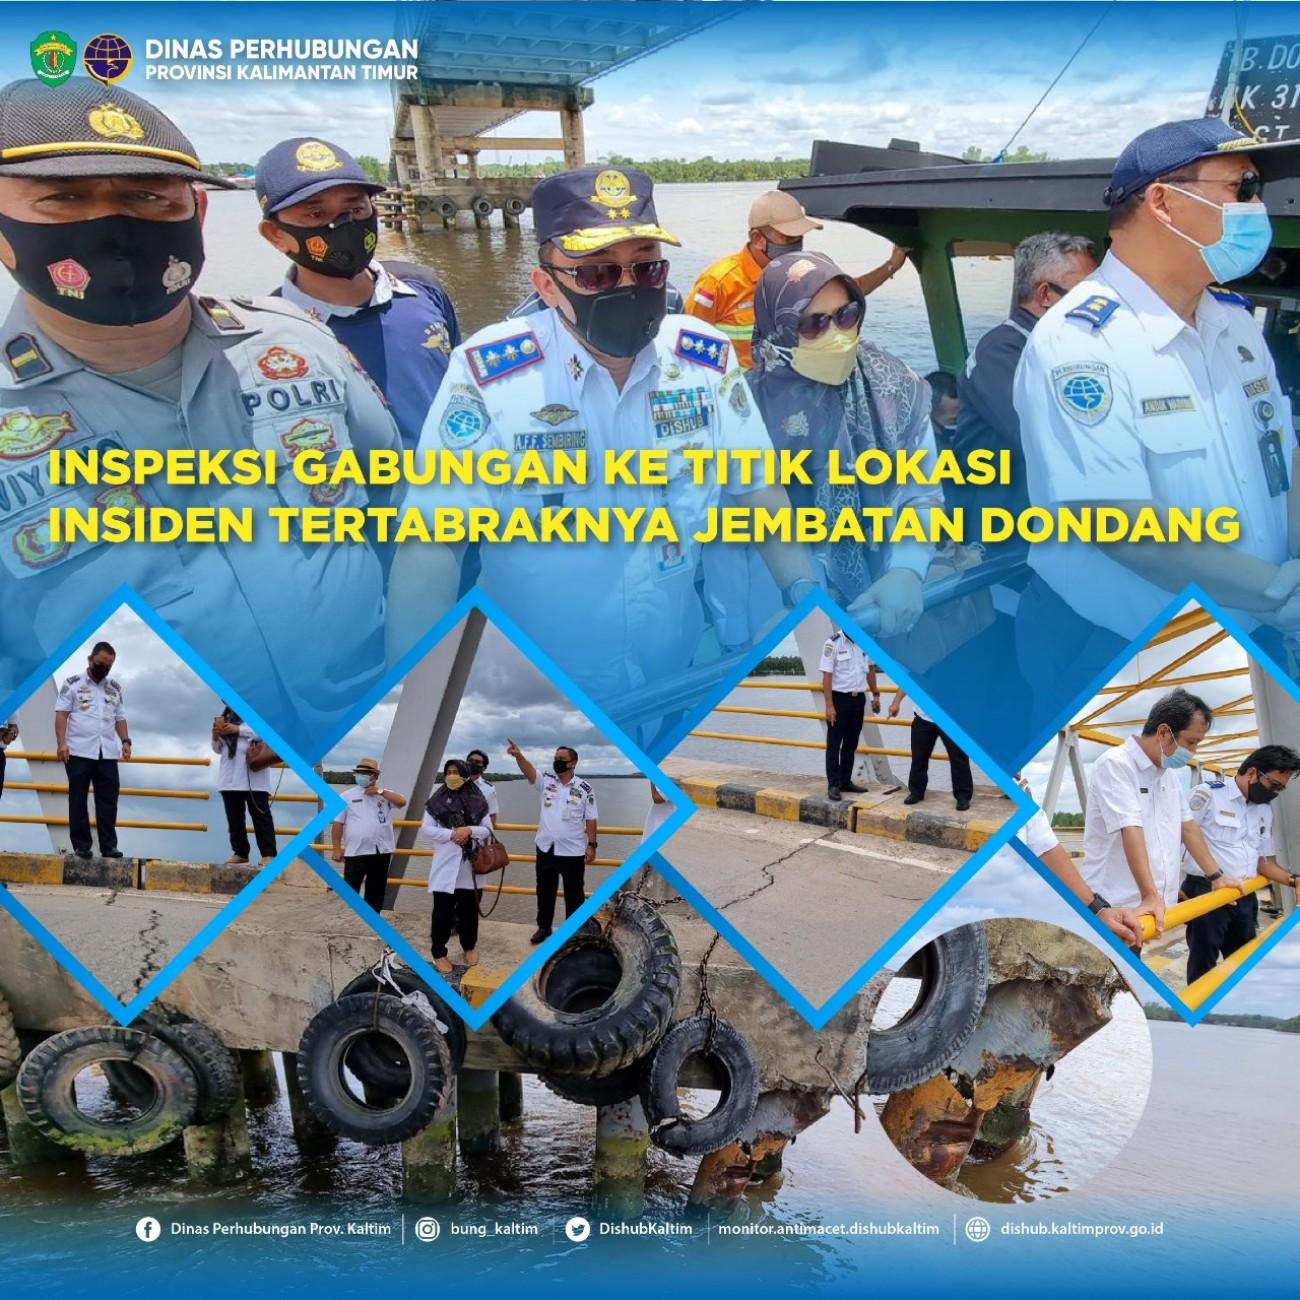 Inspeksi Gabungan ke Titik Lokasi Insiden Tertabraknya Jembatan Dondang.